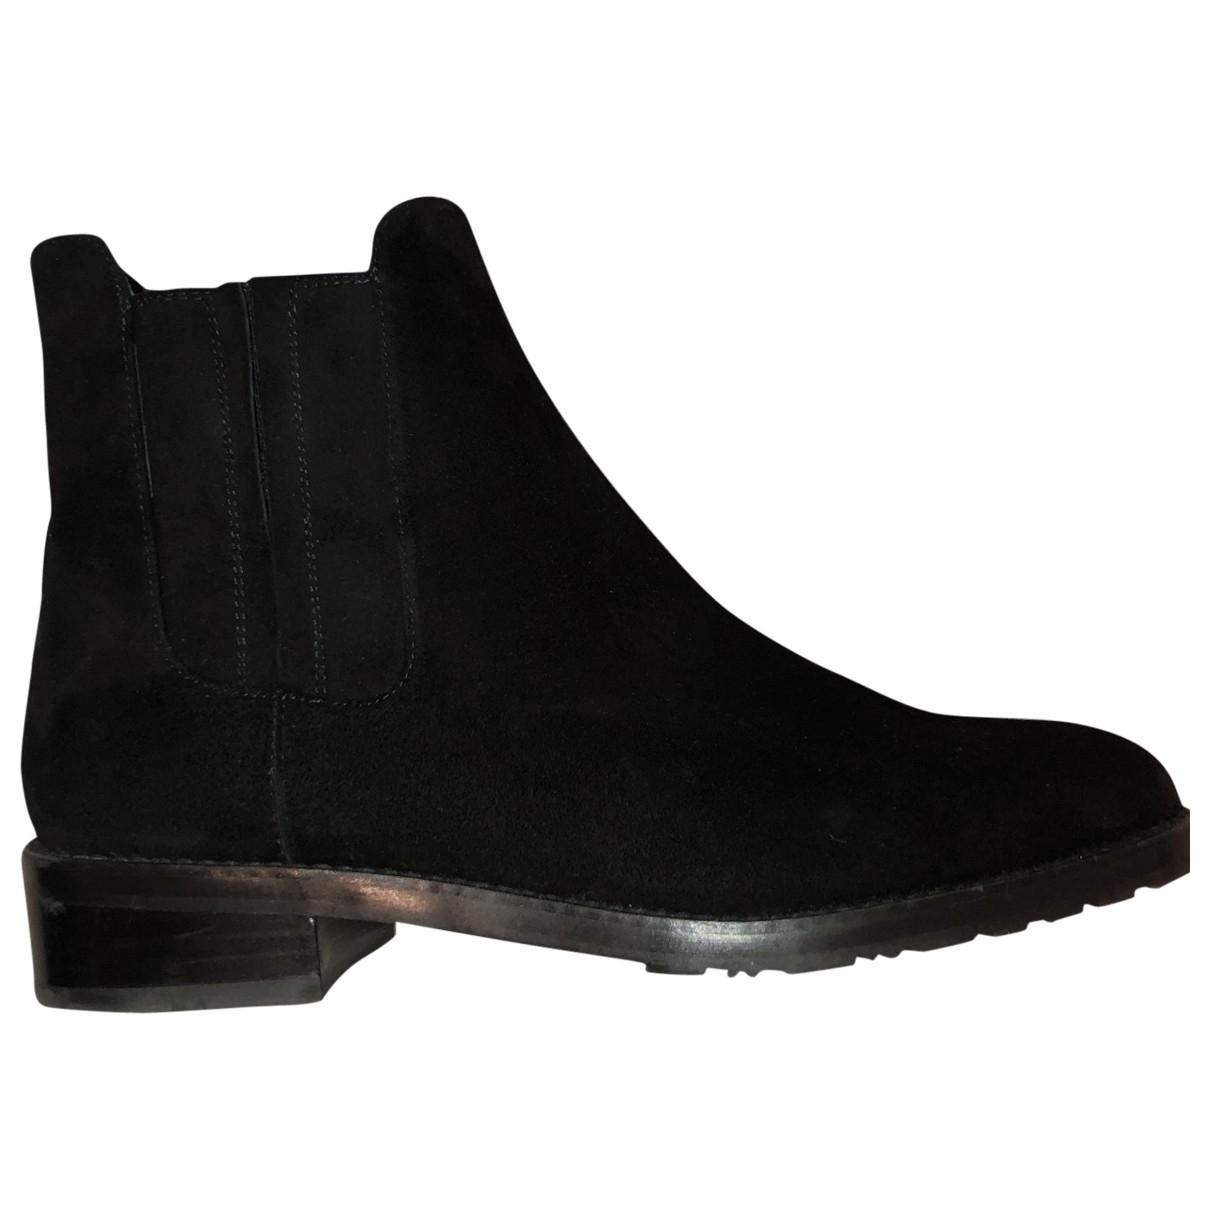 Stuart Weitzman \N Black Suede Ankle boots for Women 37.5 EU